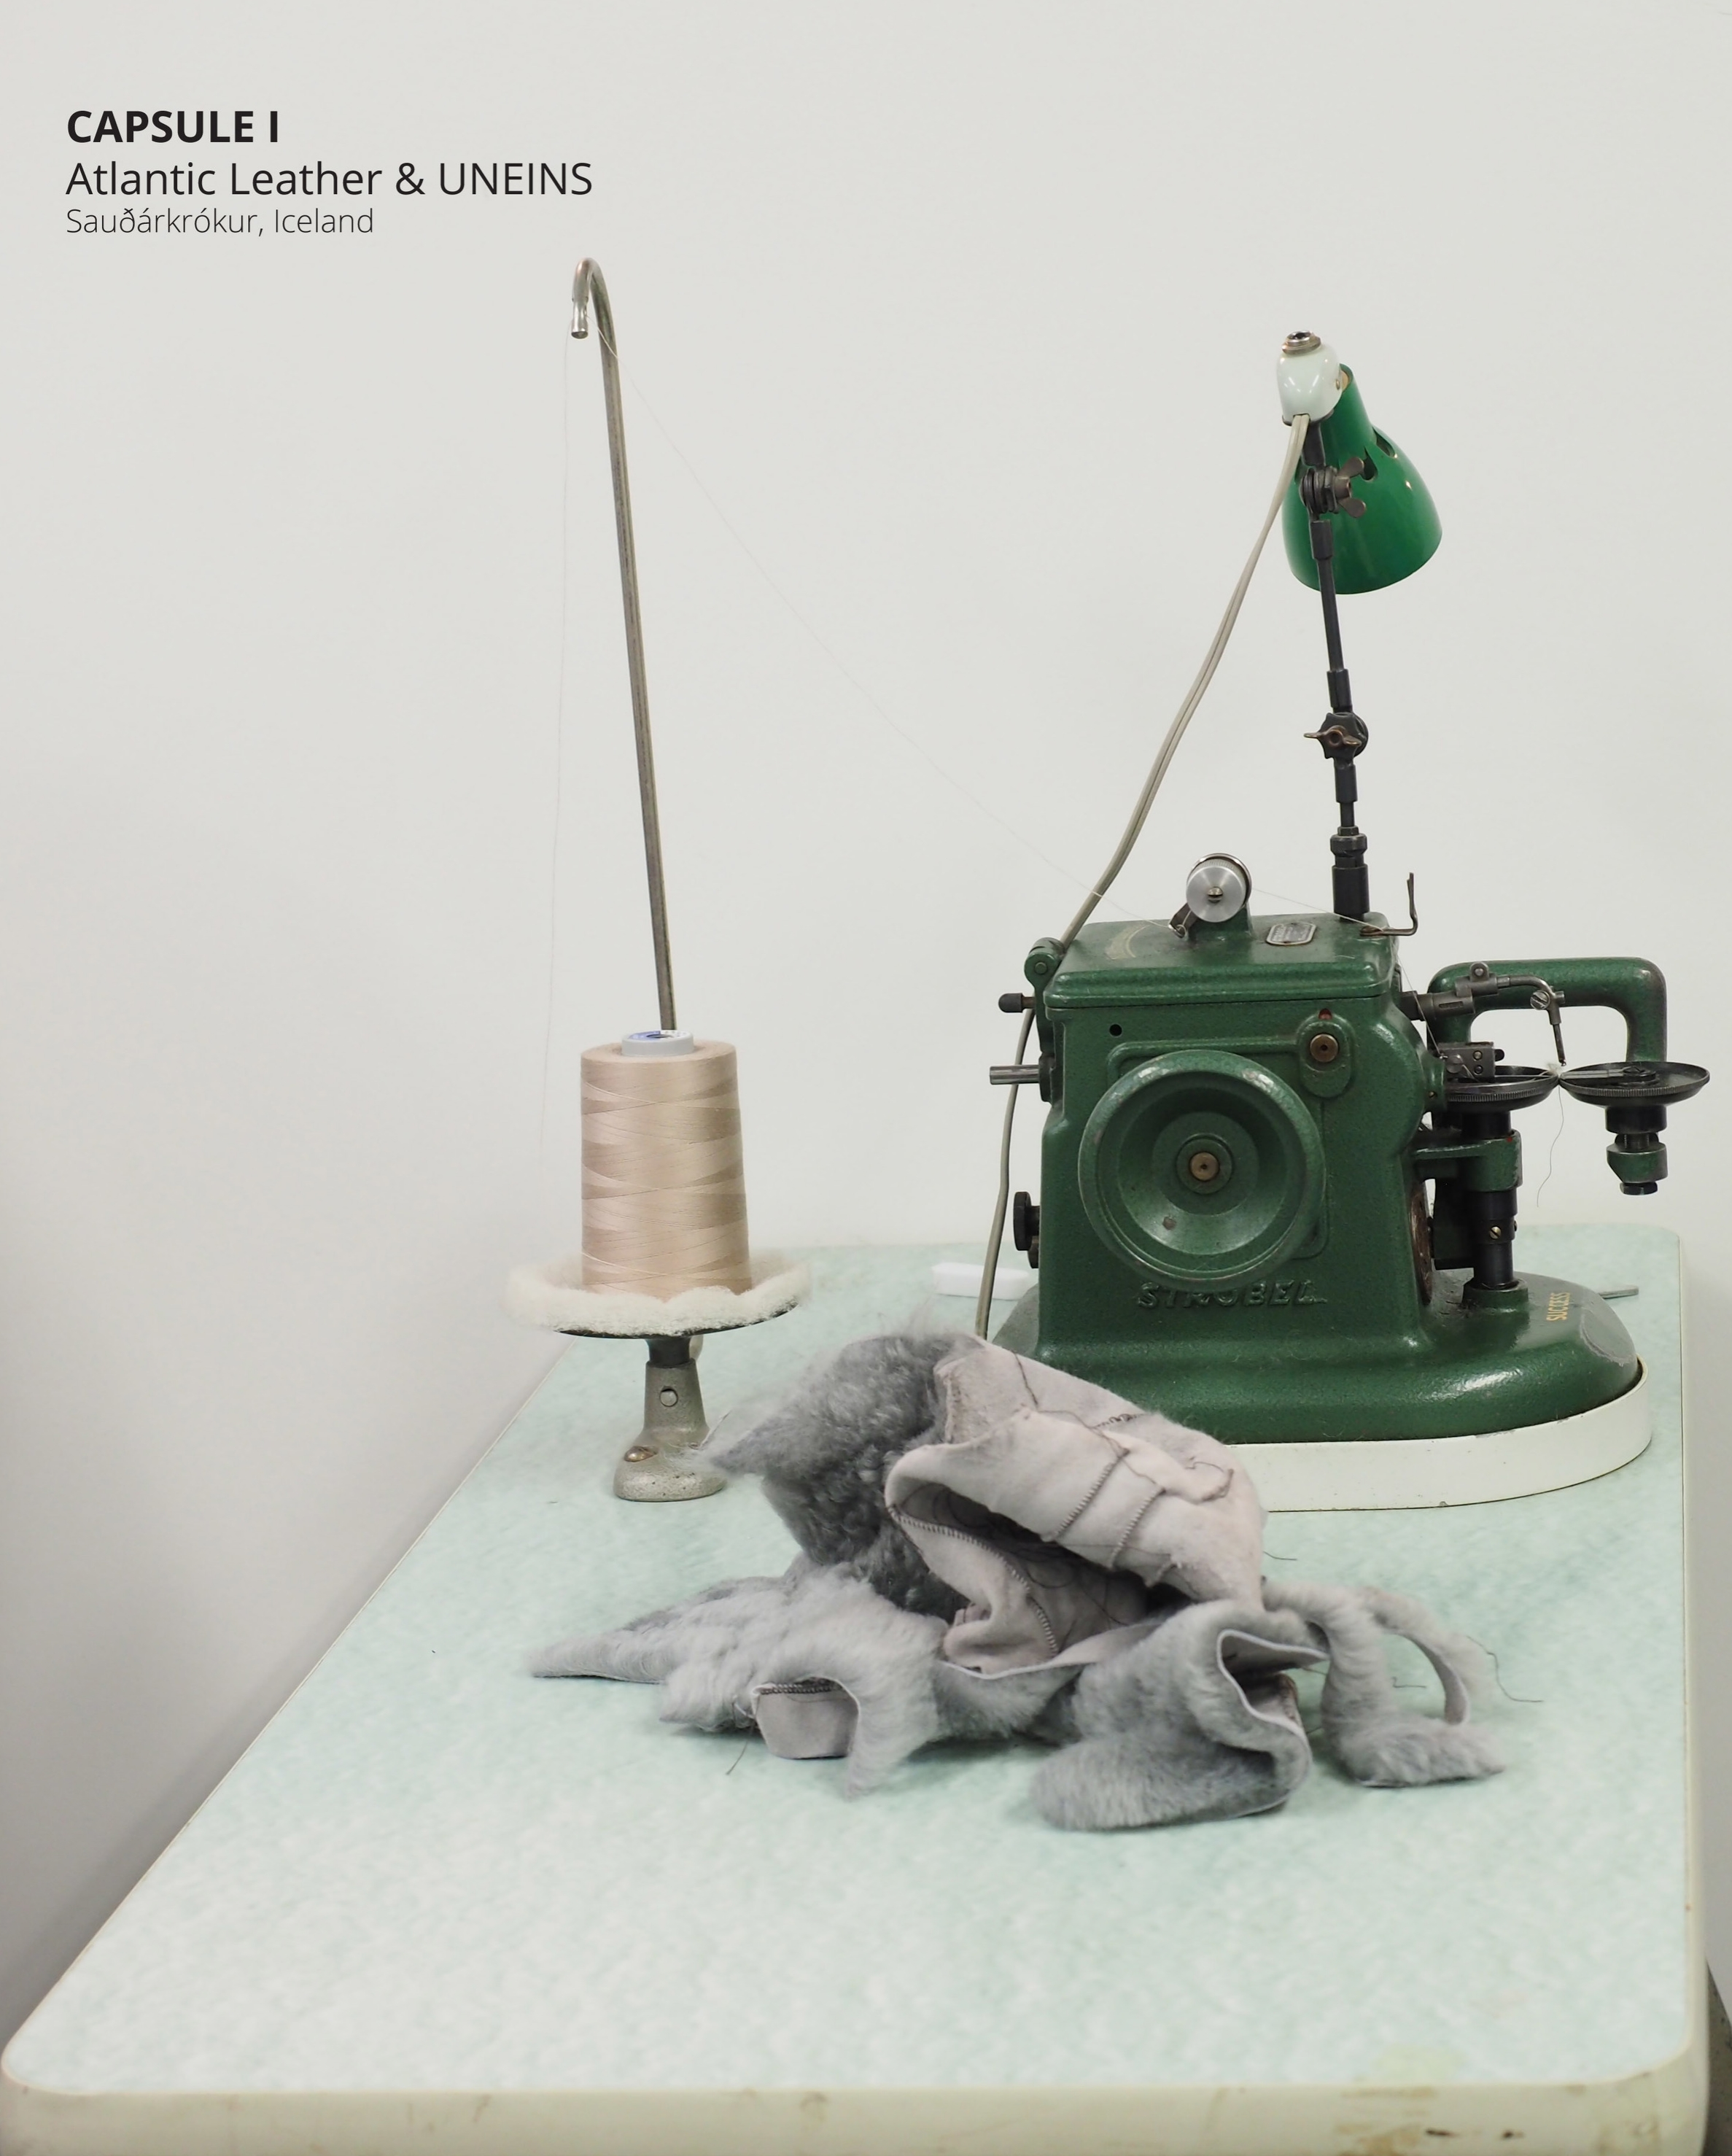 01 sewing machine.jpg